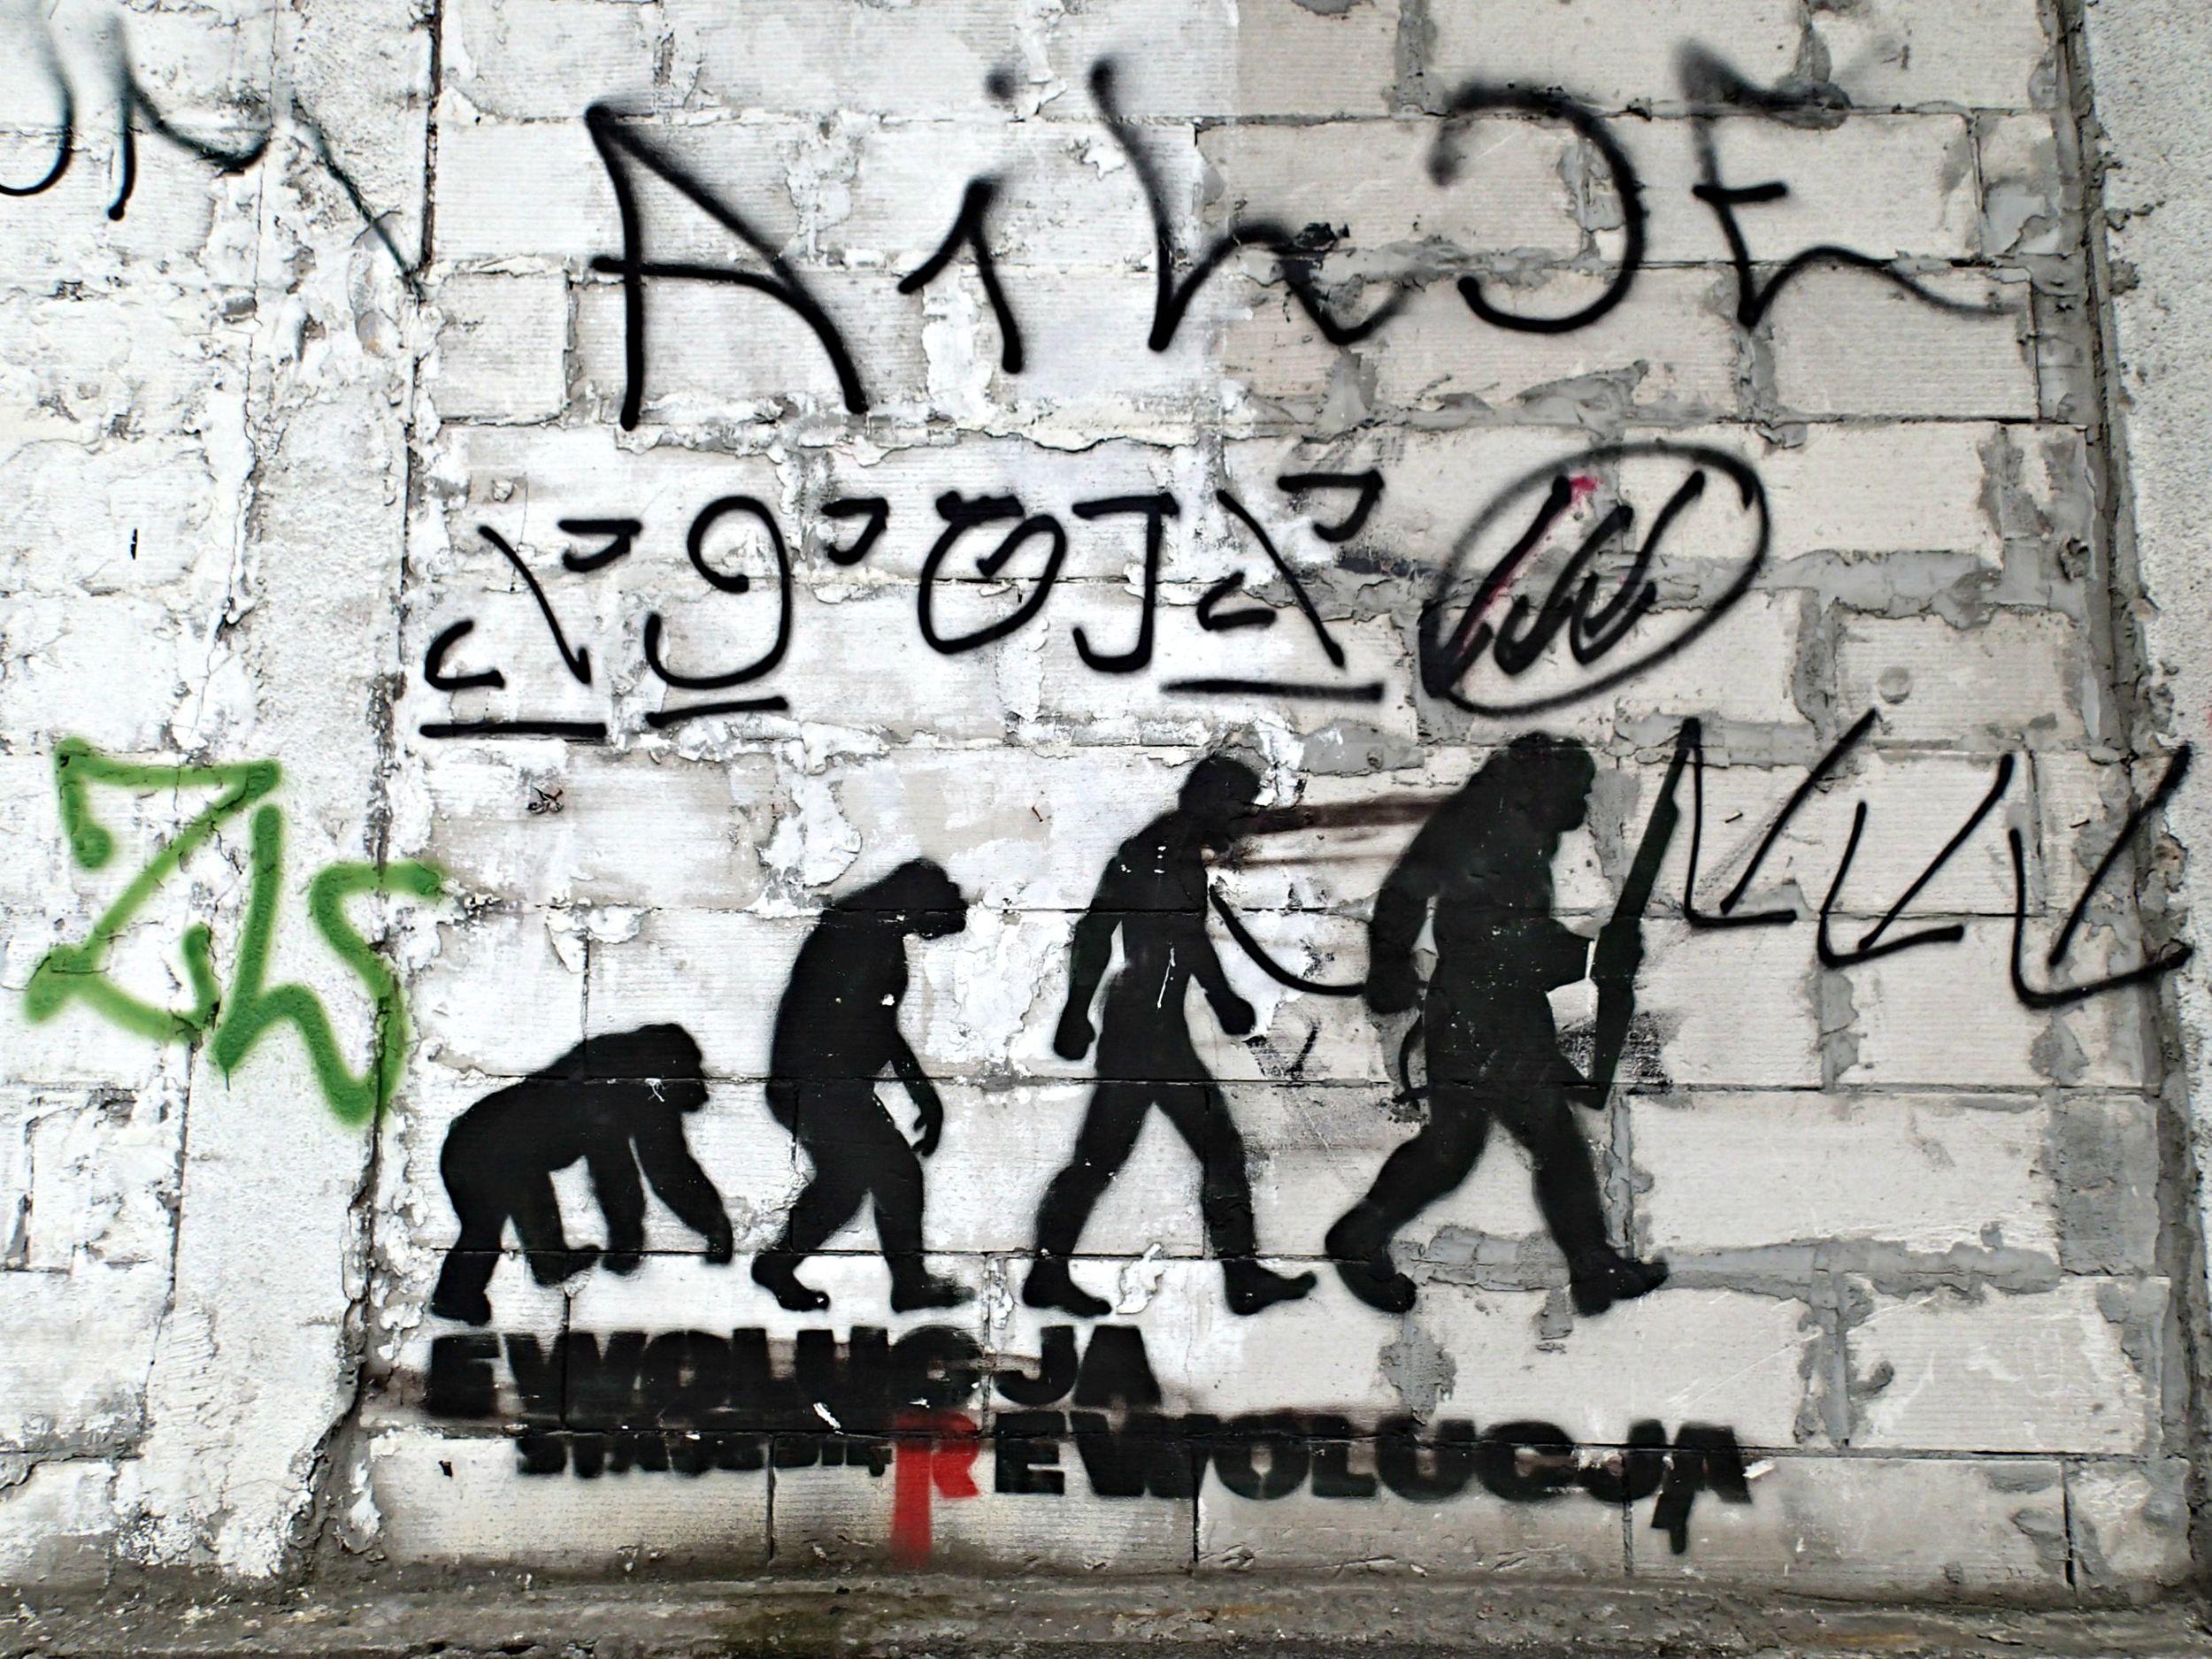 Funky Polish street art